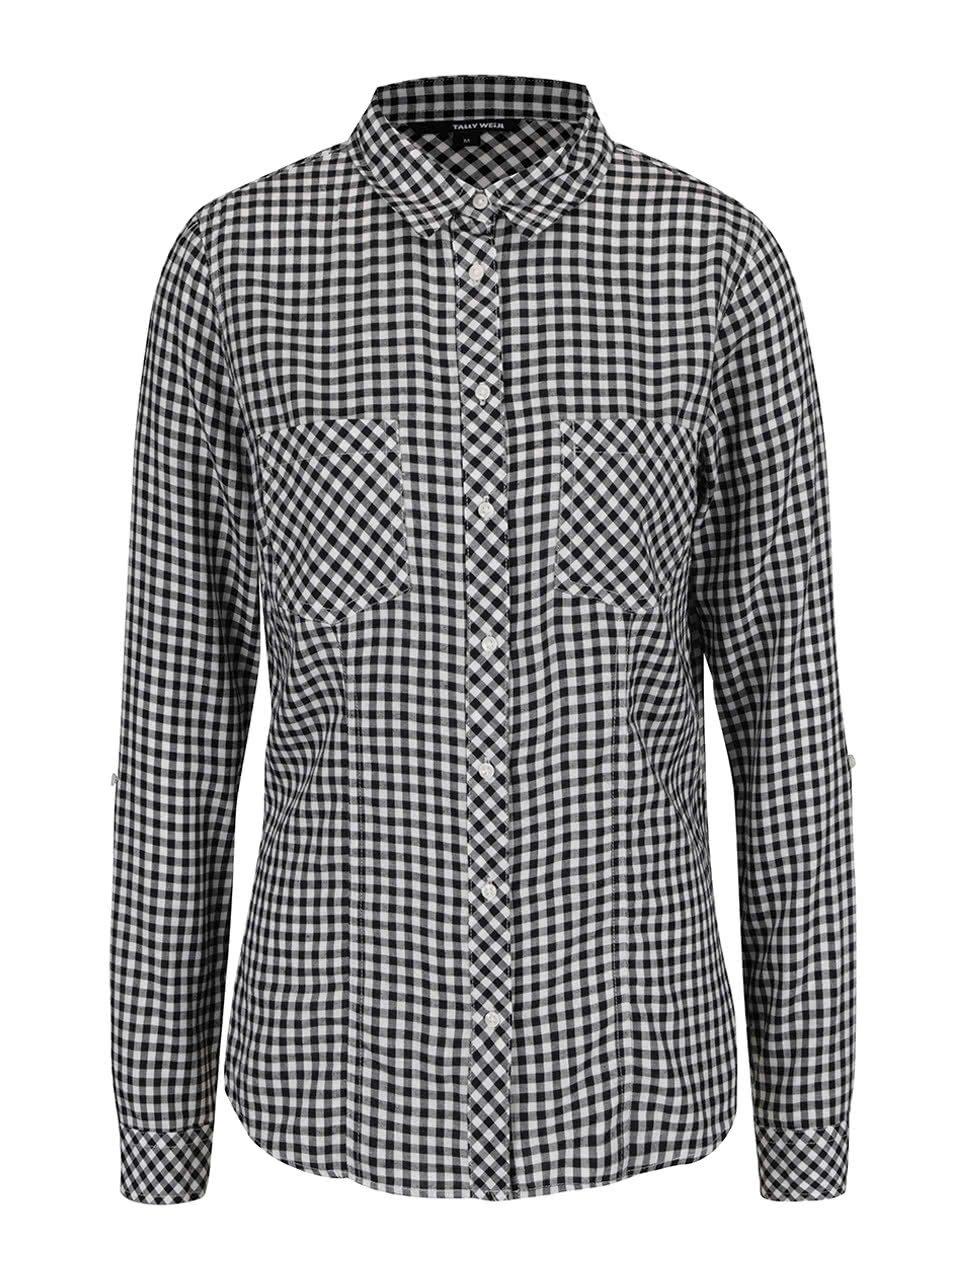 Černo-bílá kostkovaná košile TALLY WEiJL